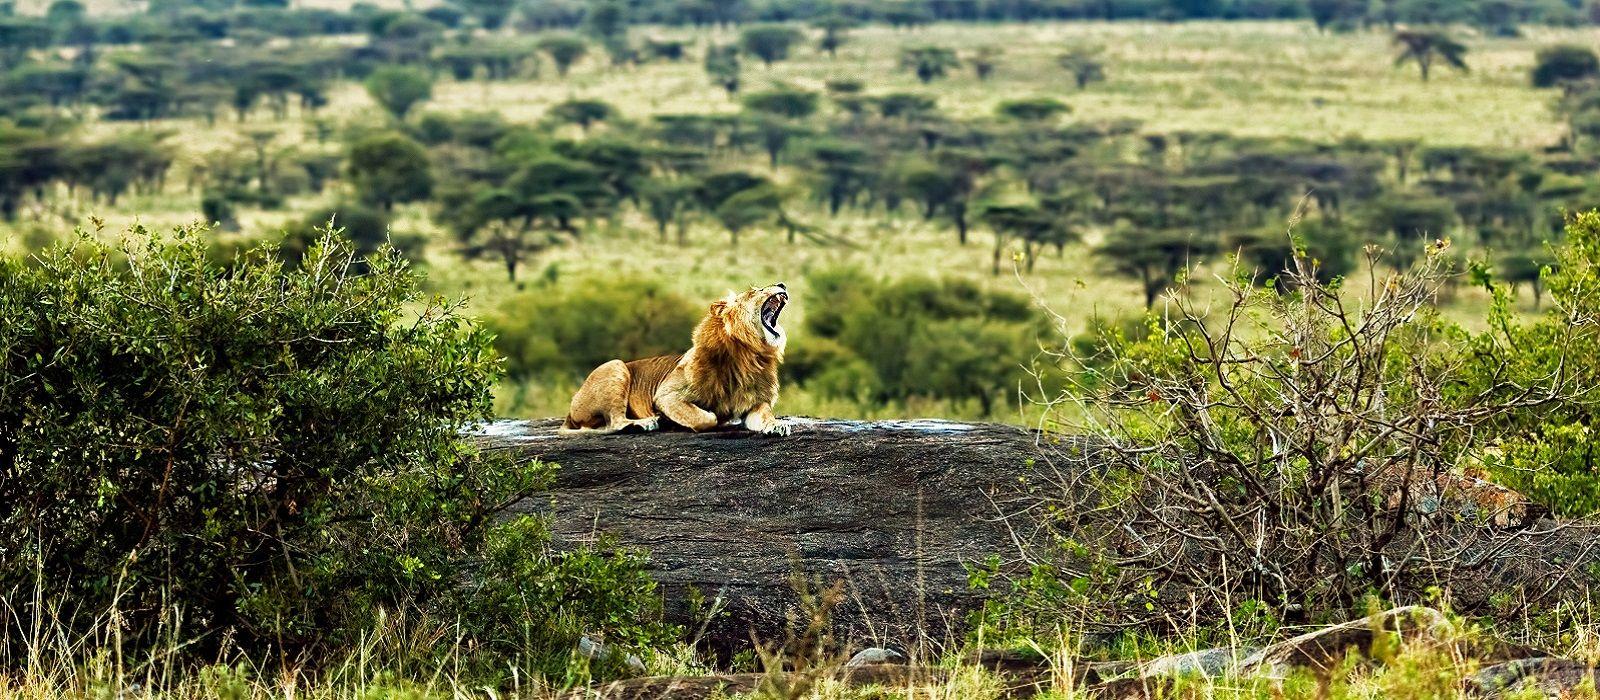 Tansania: Safari Abenteuer & romantisches Sansibar Urlaub 1